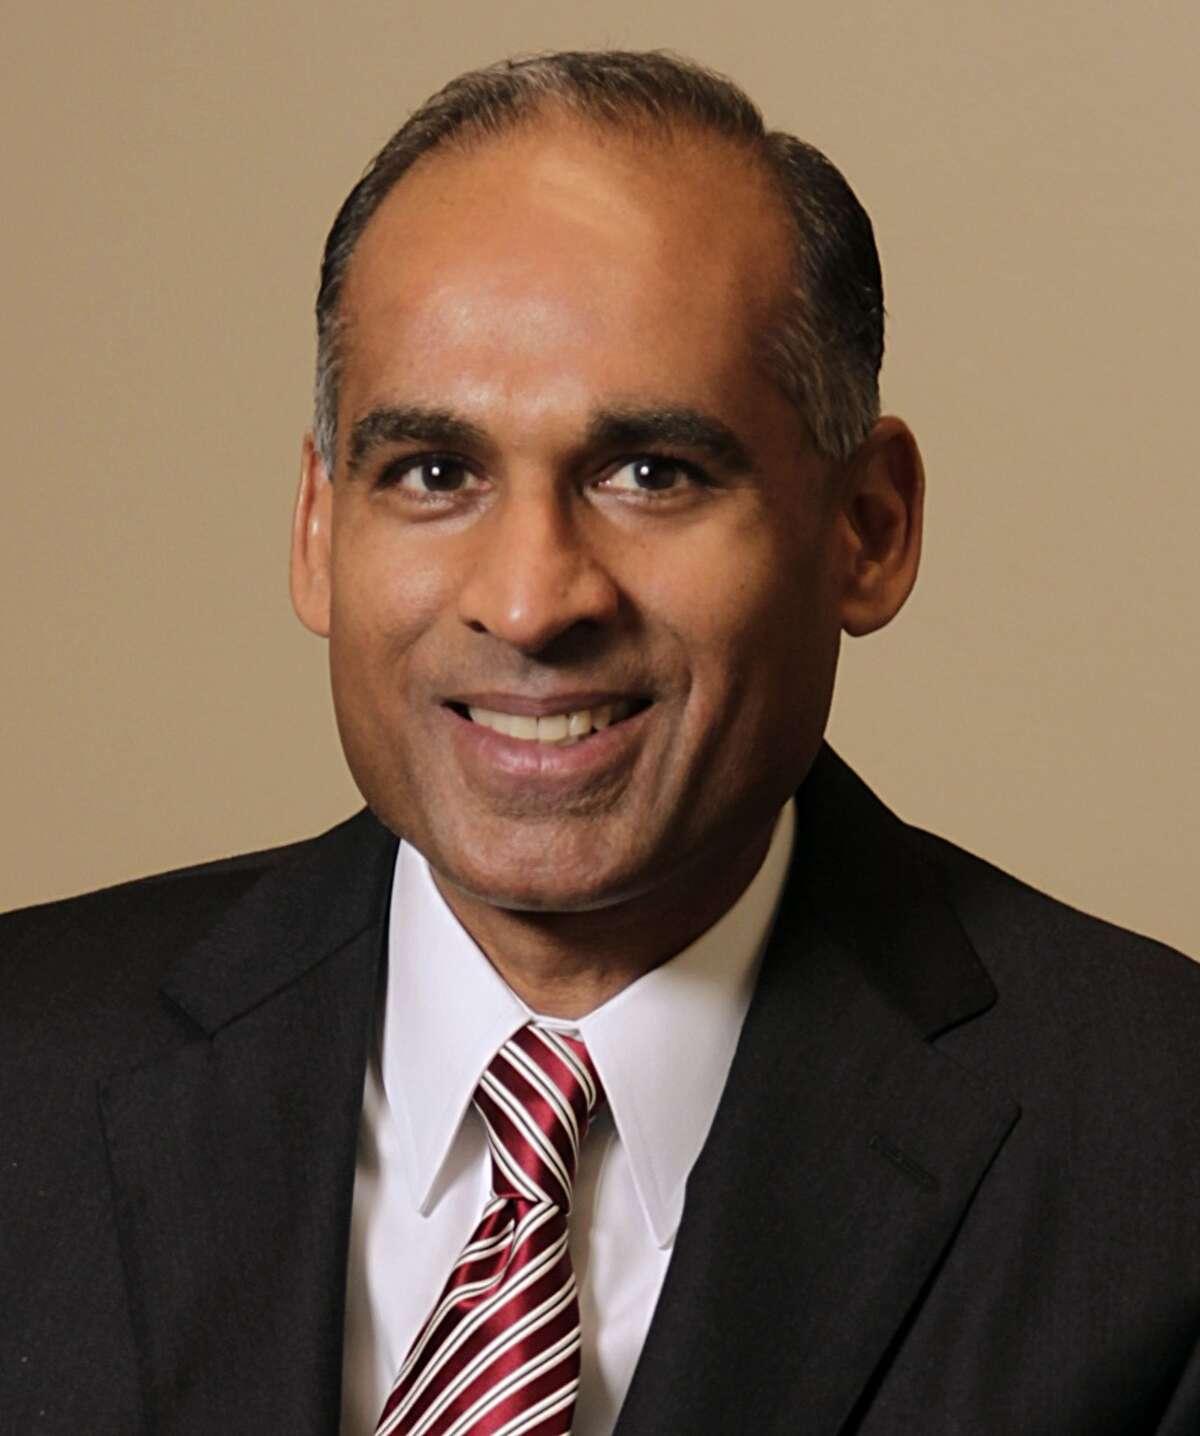 Bob V. Patel Chief Executive Officer LyondellBasell Industries N.V. Base Salary $1,218,151 Bonus $0 Stock awards $12,356,319 Stock options $6,518,771 Total compensation $24,473,813